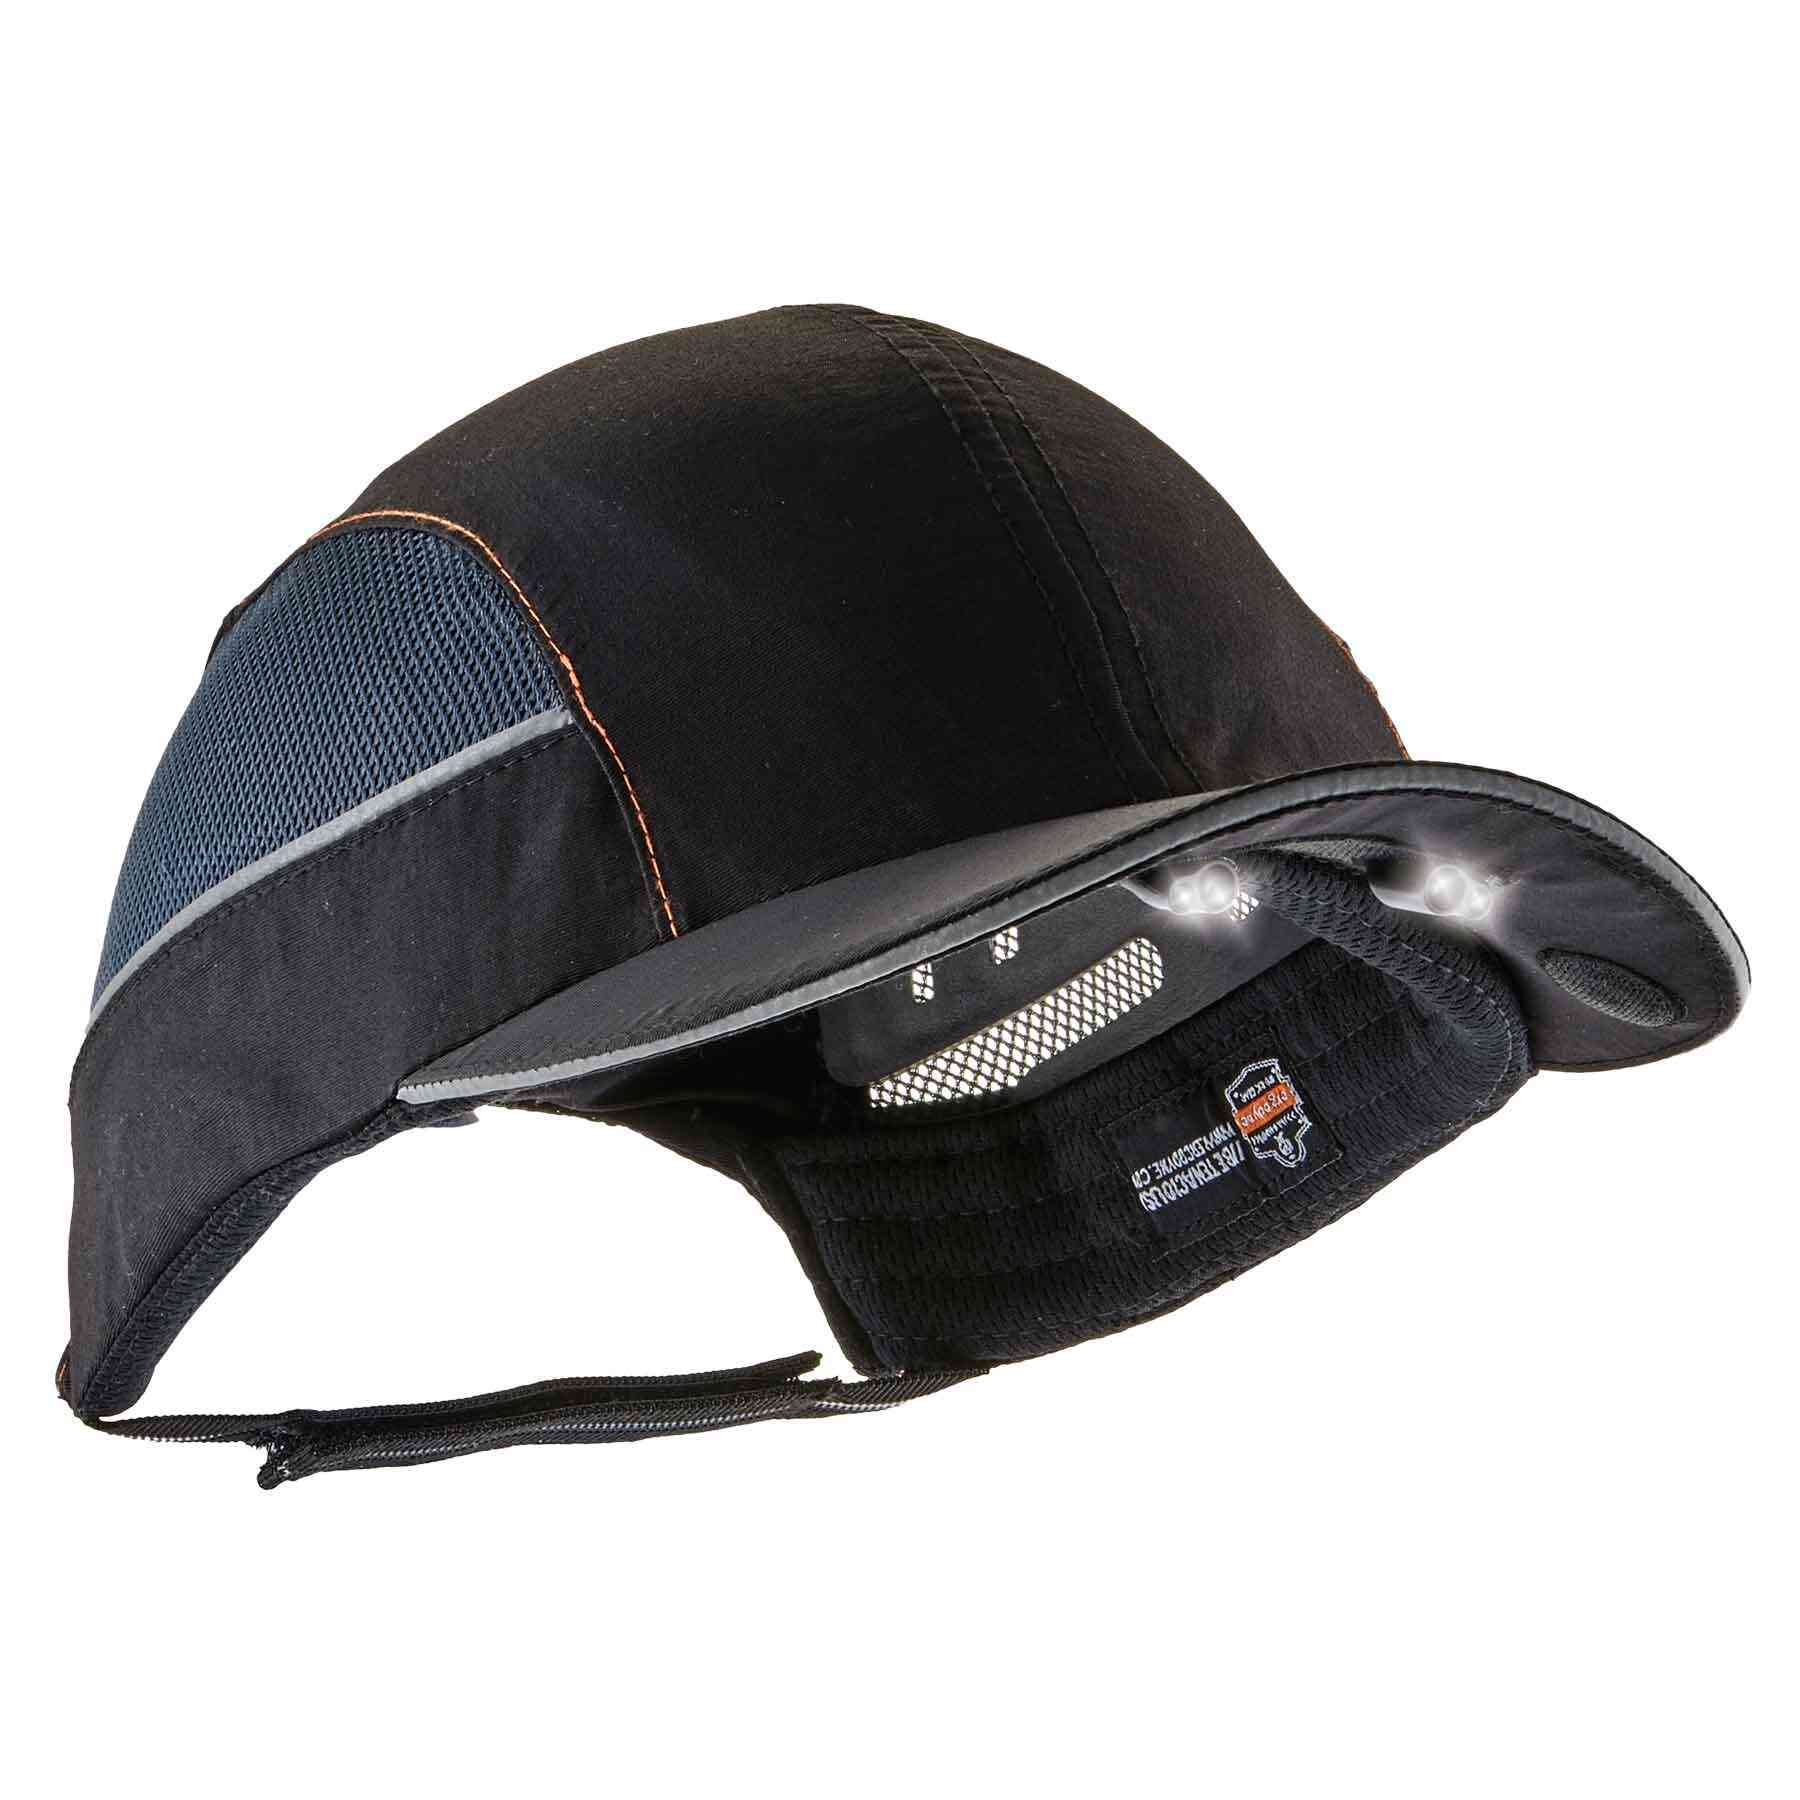 Skullerz 8960 Bump Cap Hat w/ LED Lighting